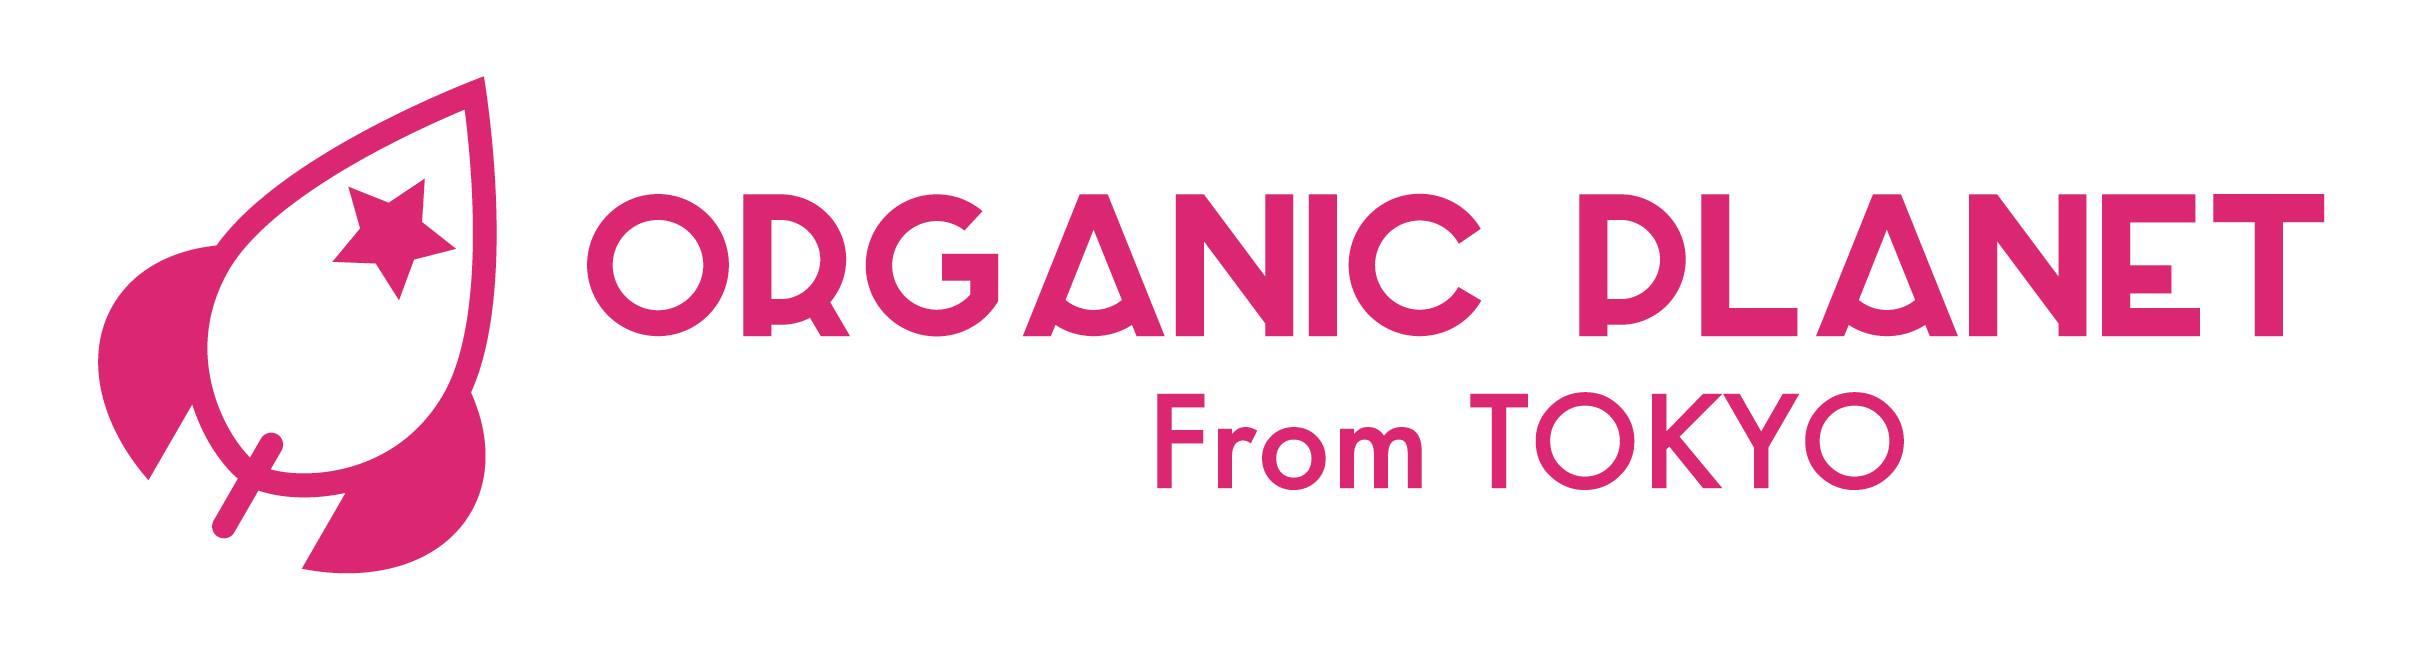 Organic Planet 様